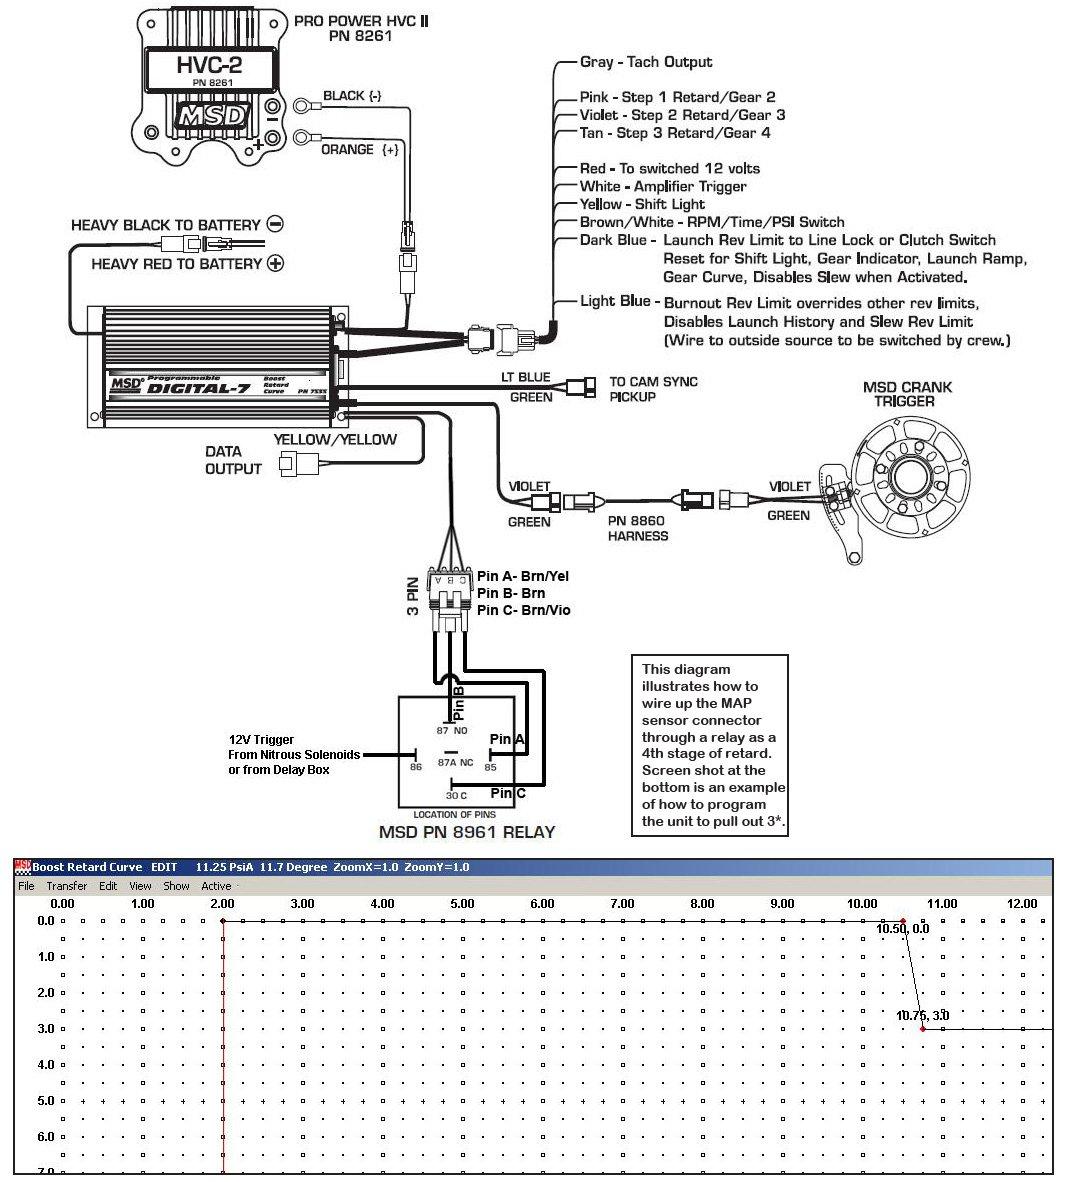 medium resolution of 7320 msd ignition wiring diagram wiring diagram progresif msd 8360 wiring diagram 7320 msd ignition wiring diagram